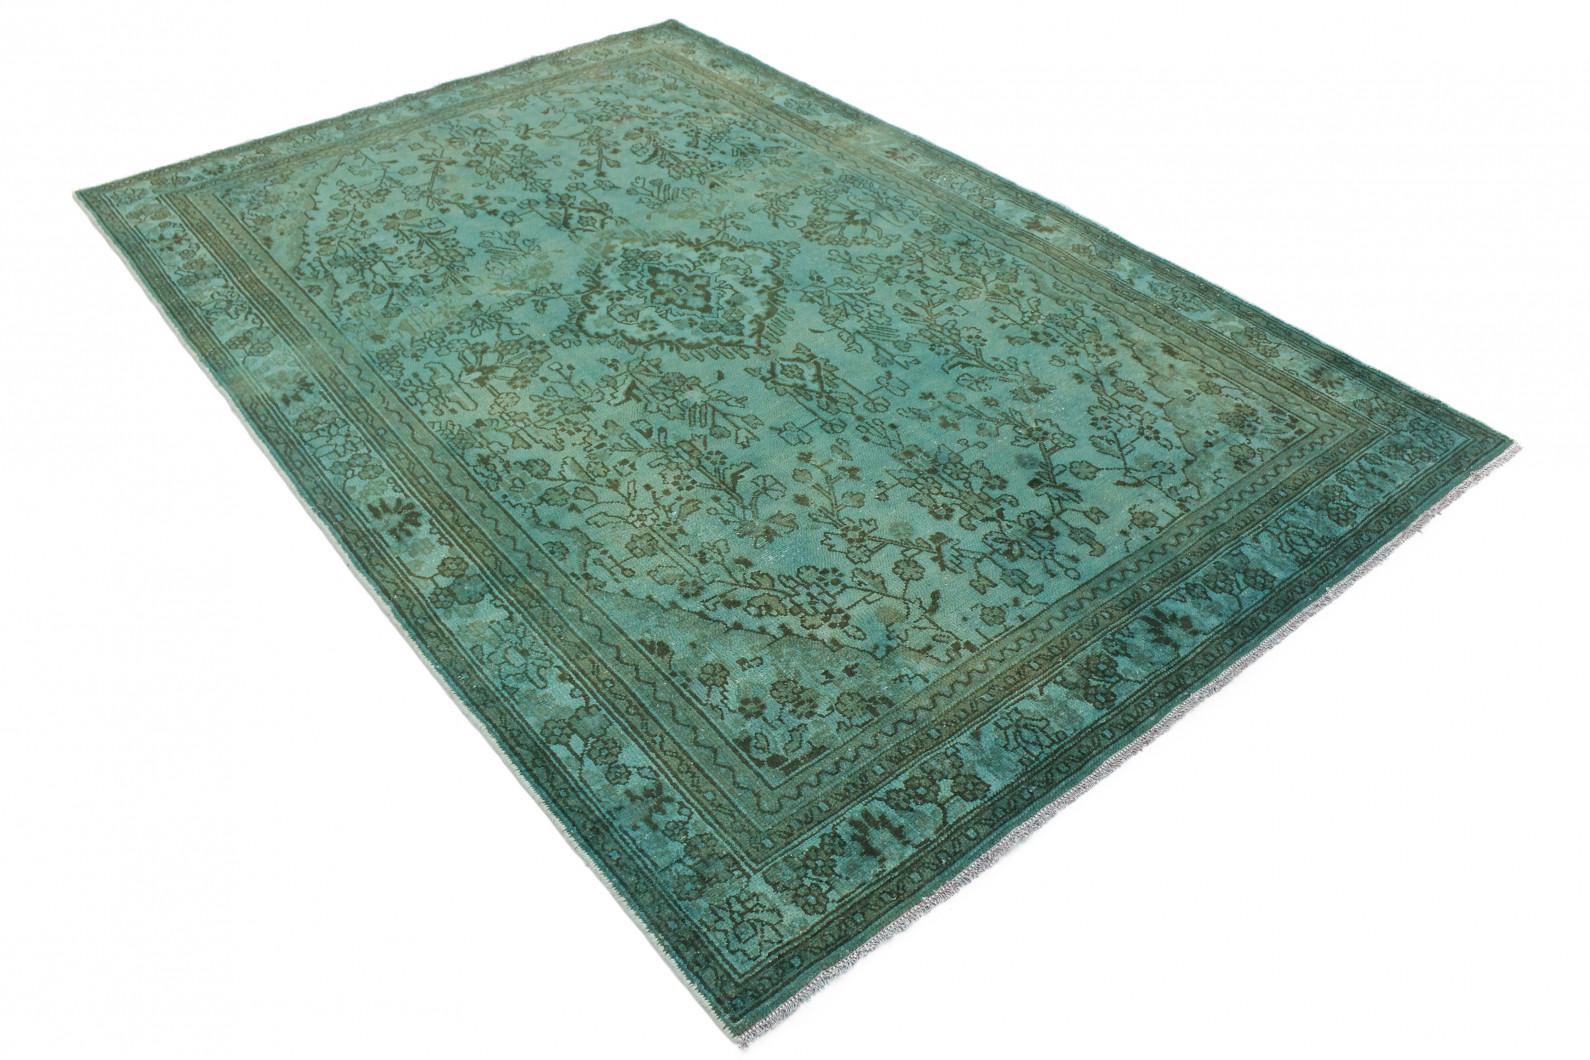 vintage teppich gr n in 300x200 1001 3710 bei kaufen. Black Bedroom Furniture Sets. Home Design Ideas